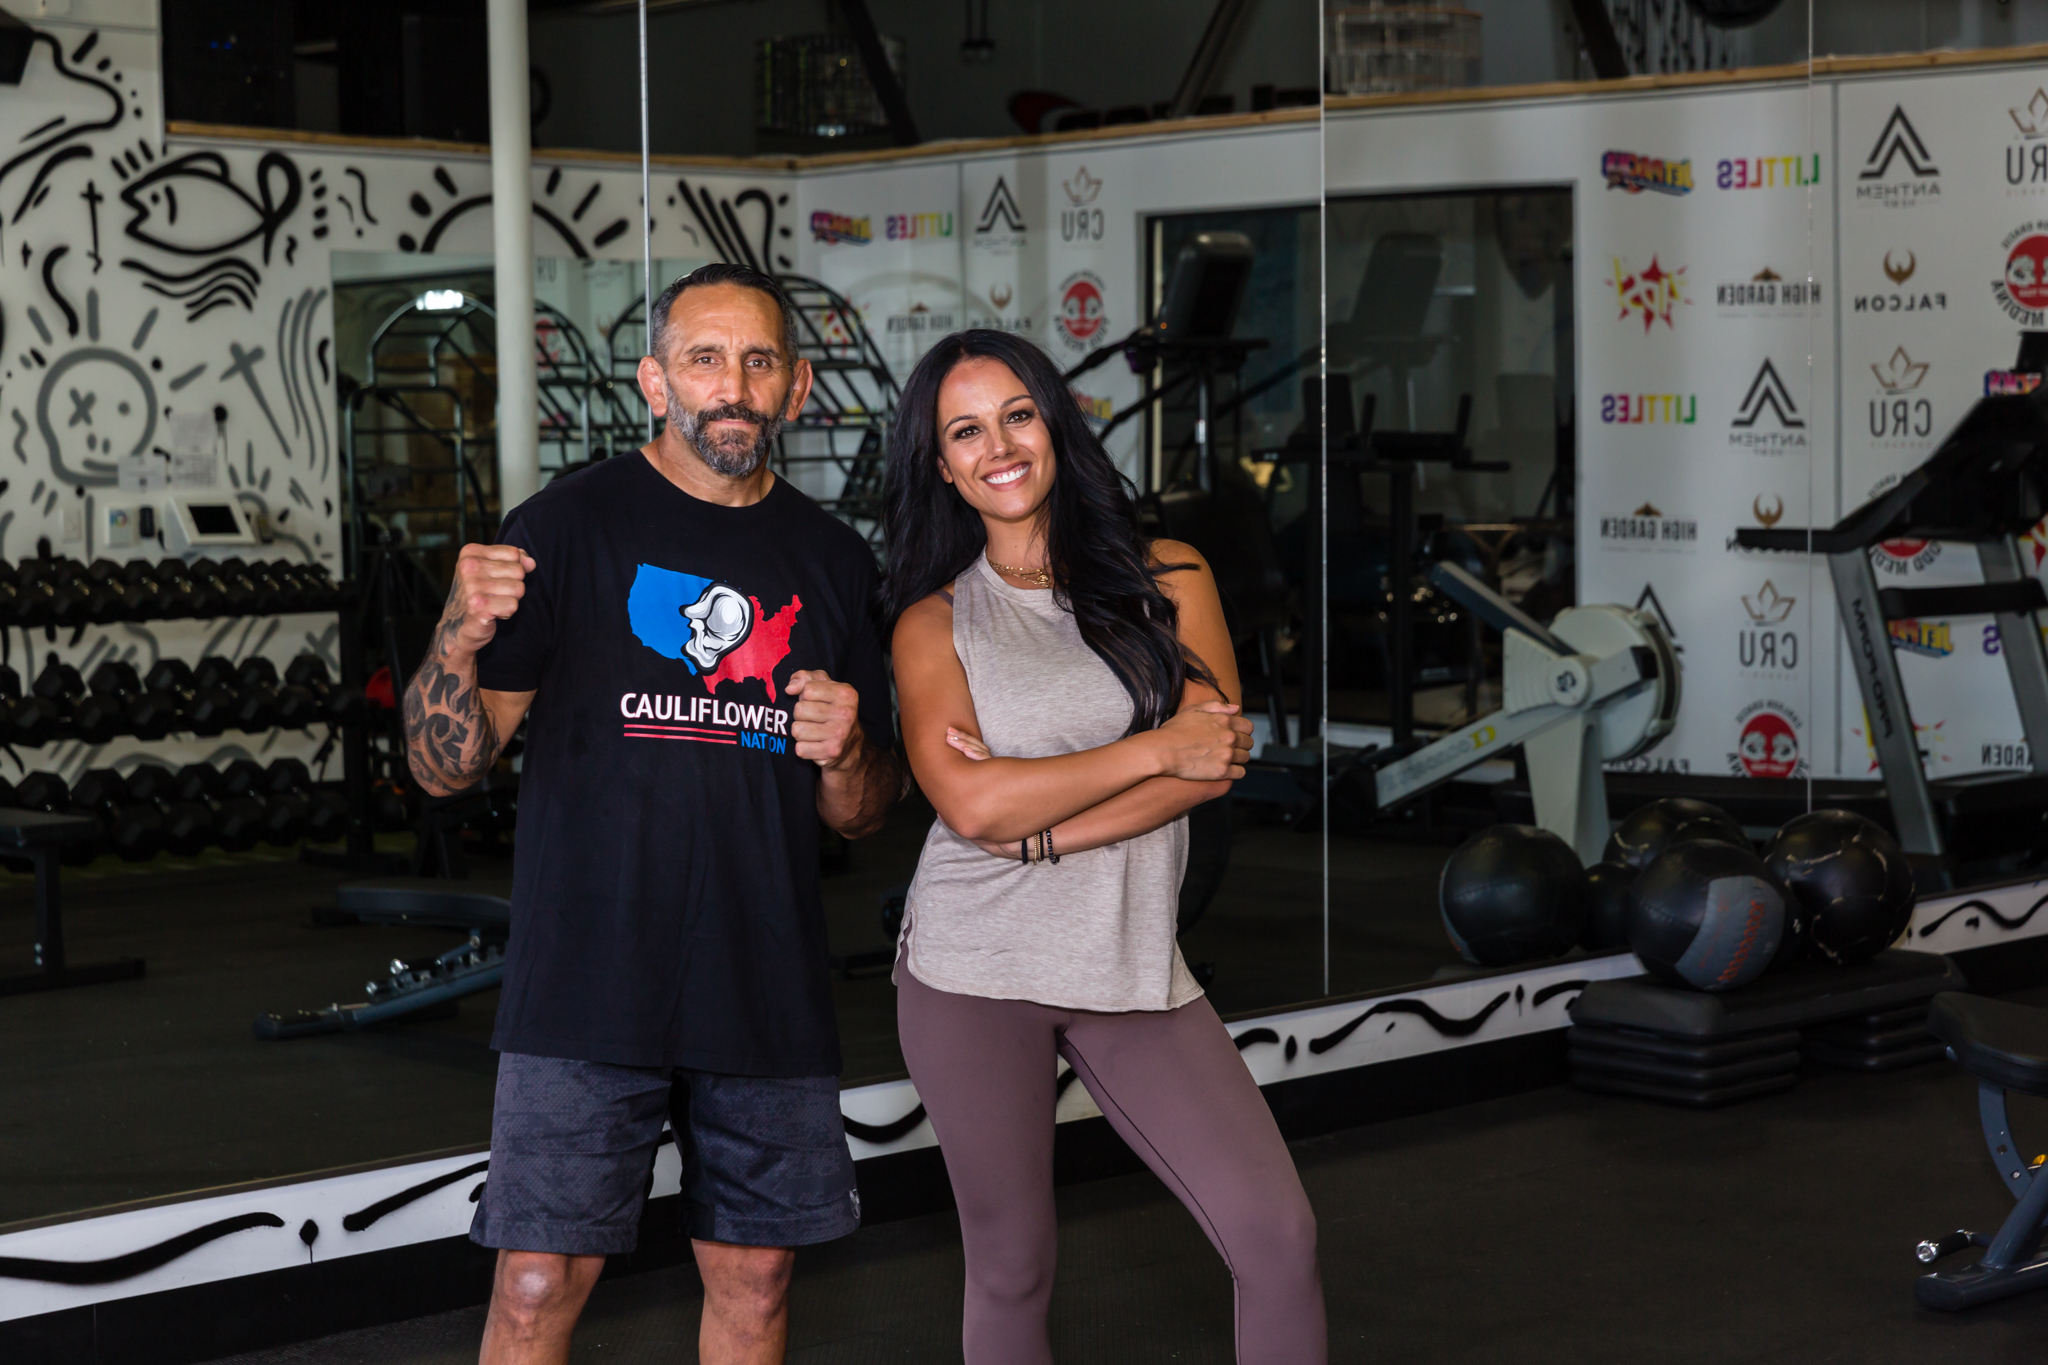 Katelynn Ansari and Todd Medina Teach Women to Fight Back through Self Defense